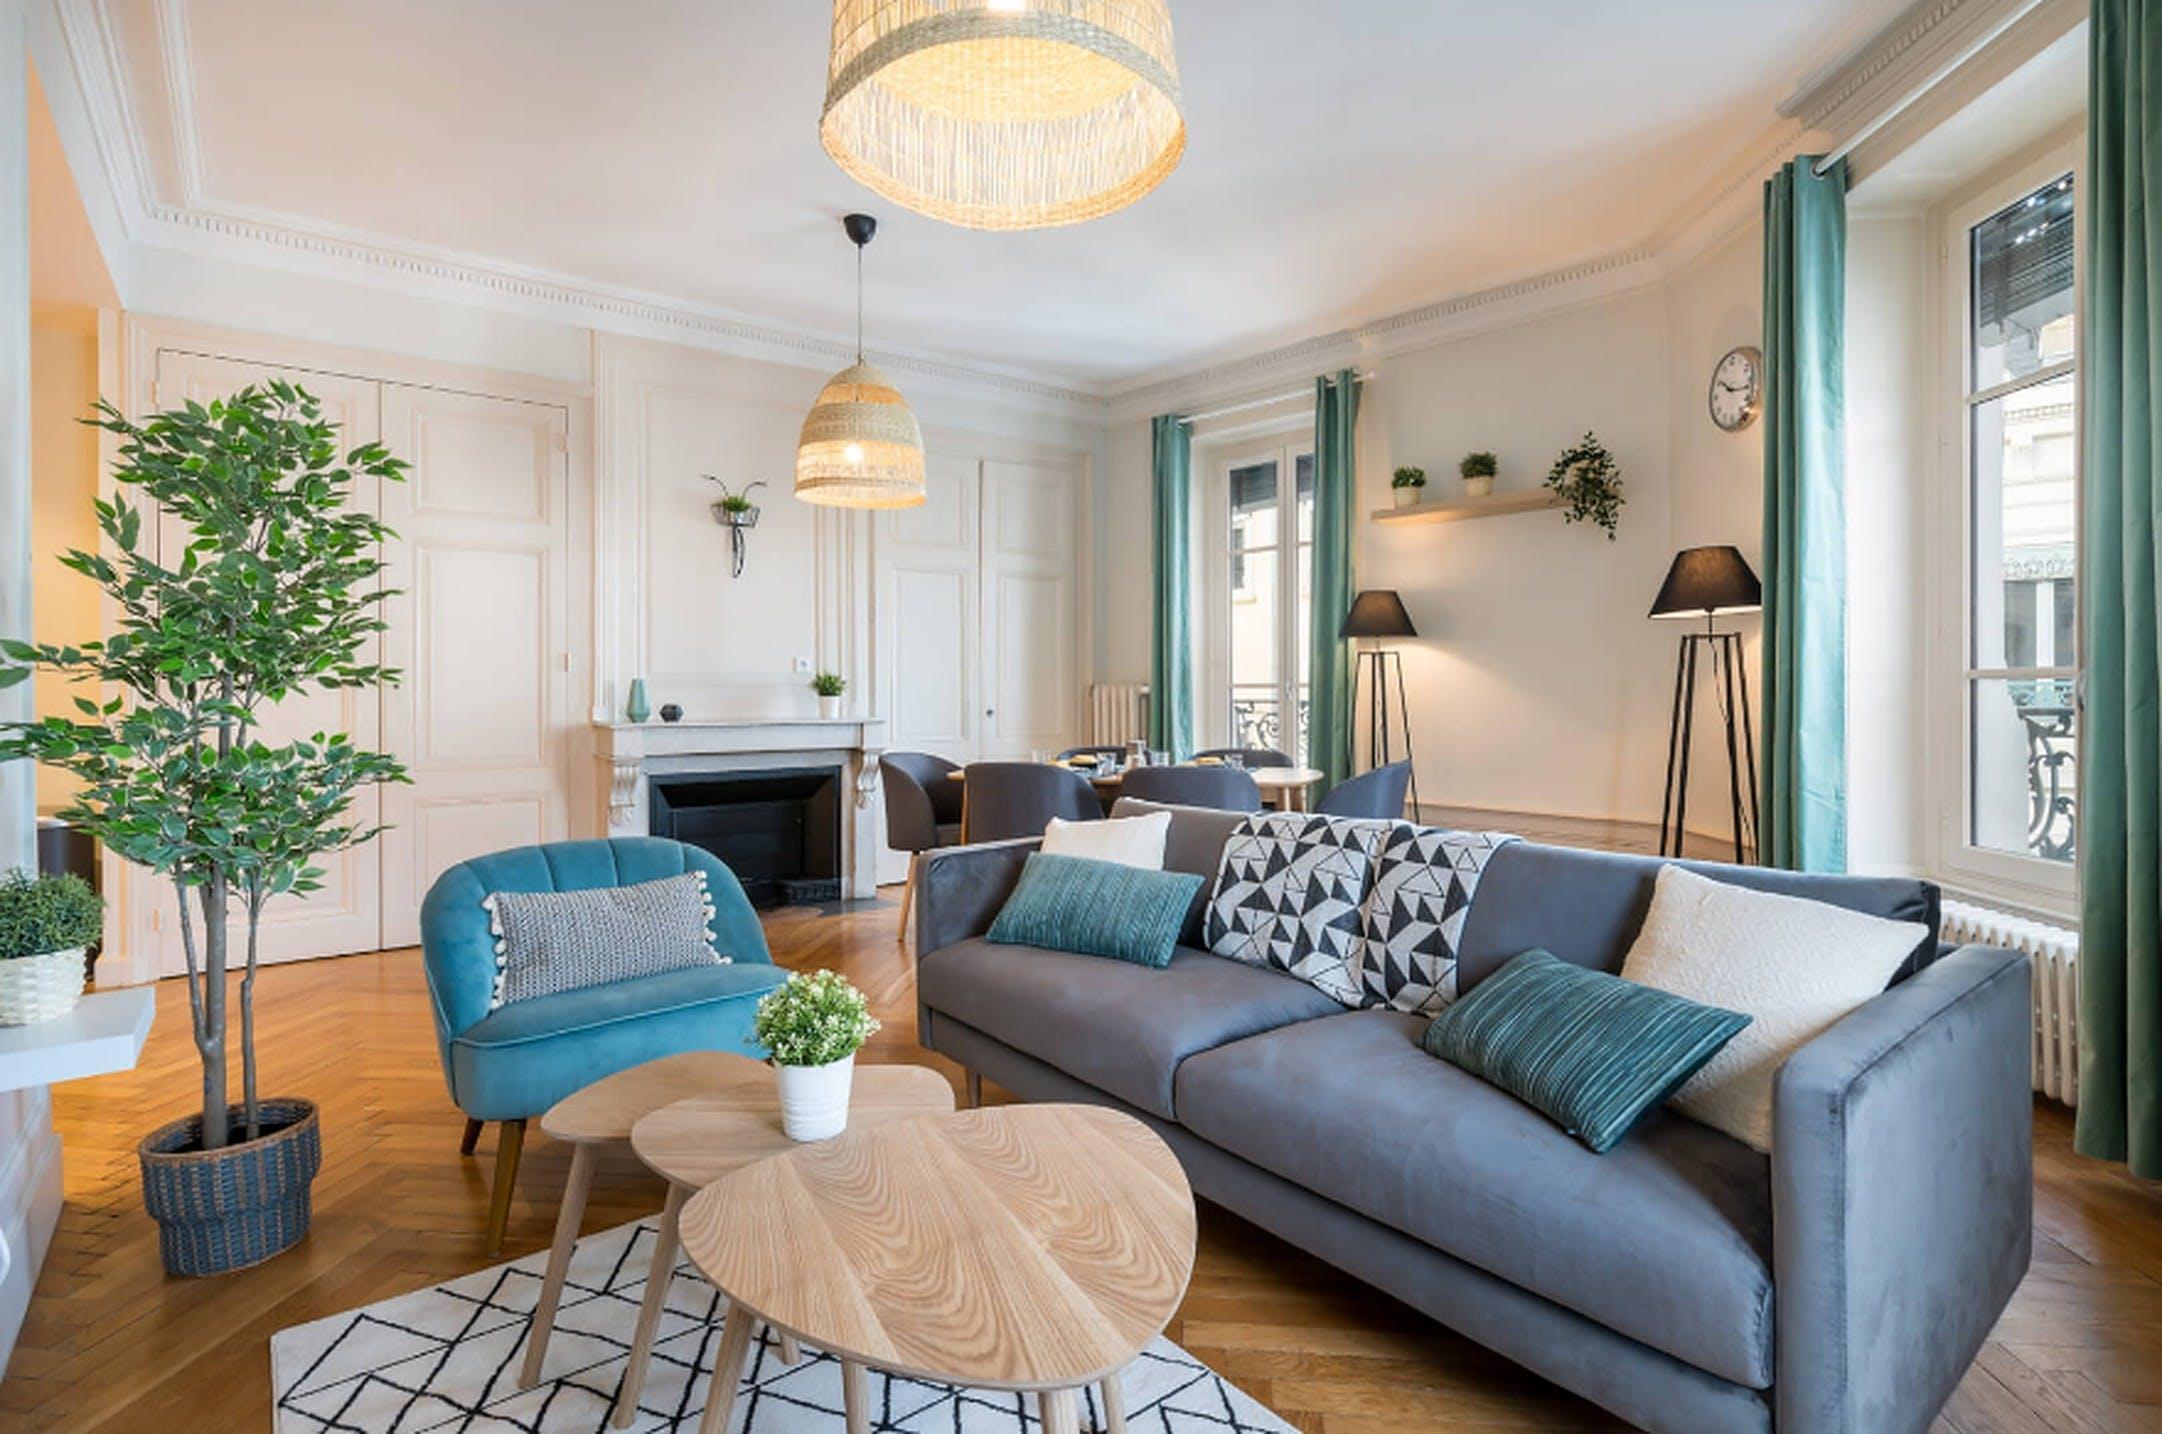 5 Residents | Hôtel de Ville | Outstanding Renovated Apt.